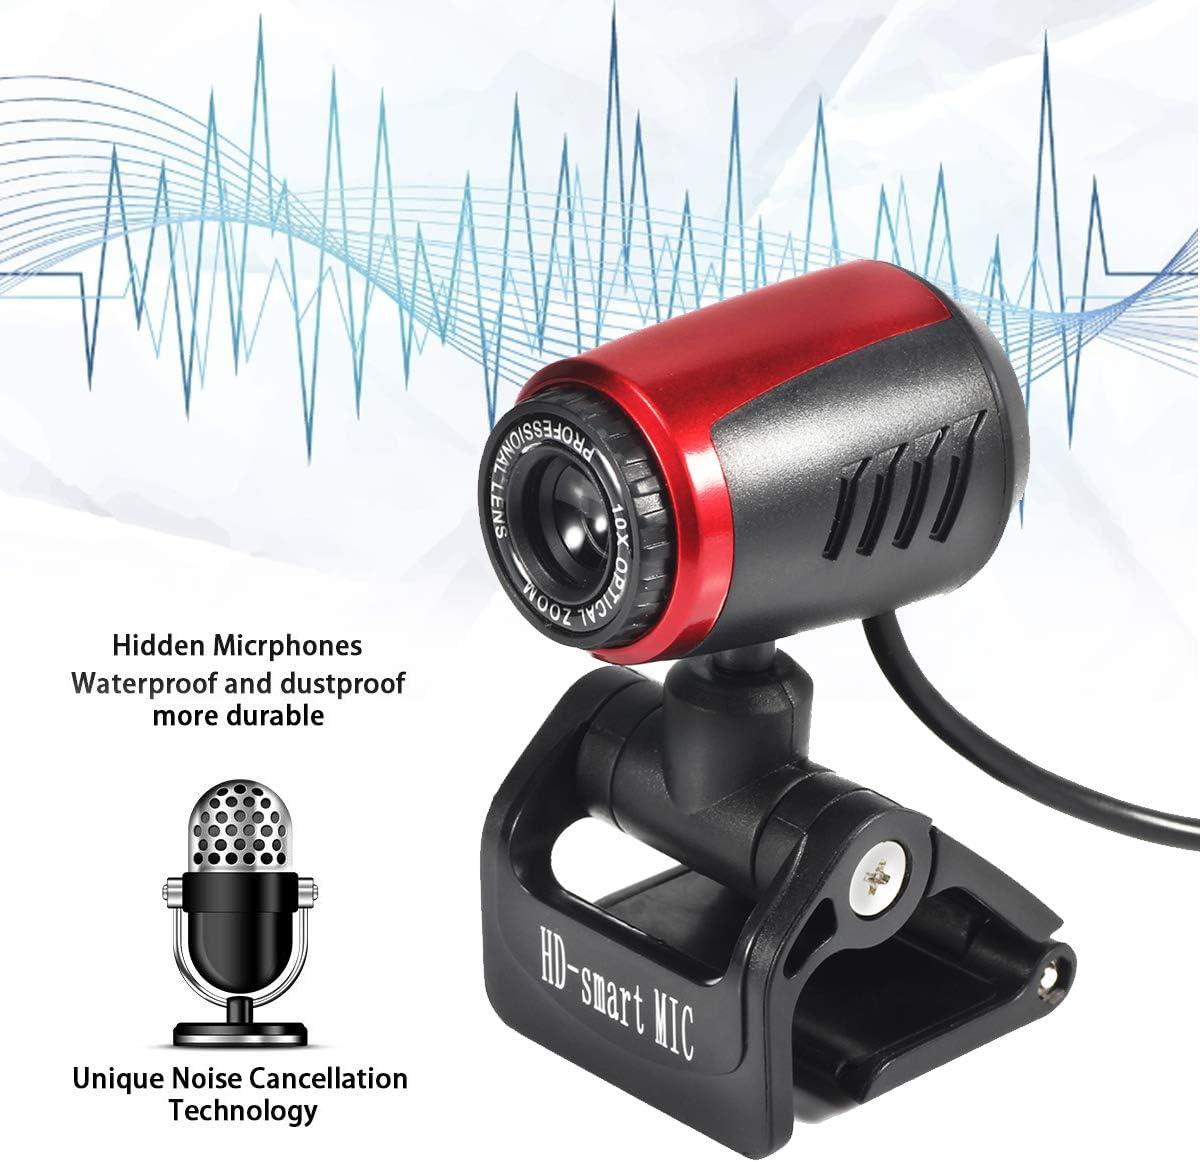 OhhGo Computer Webcam with Microphone 0.8 Megapixel USB 2.0 Rotatable Camera Desktop PC HD Video Webcam